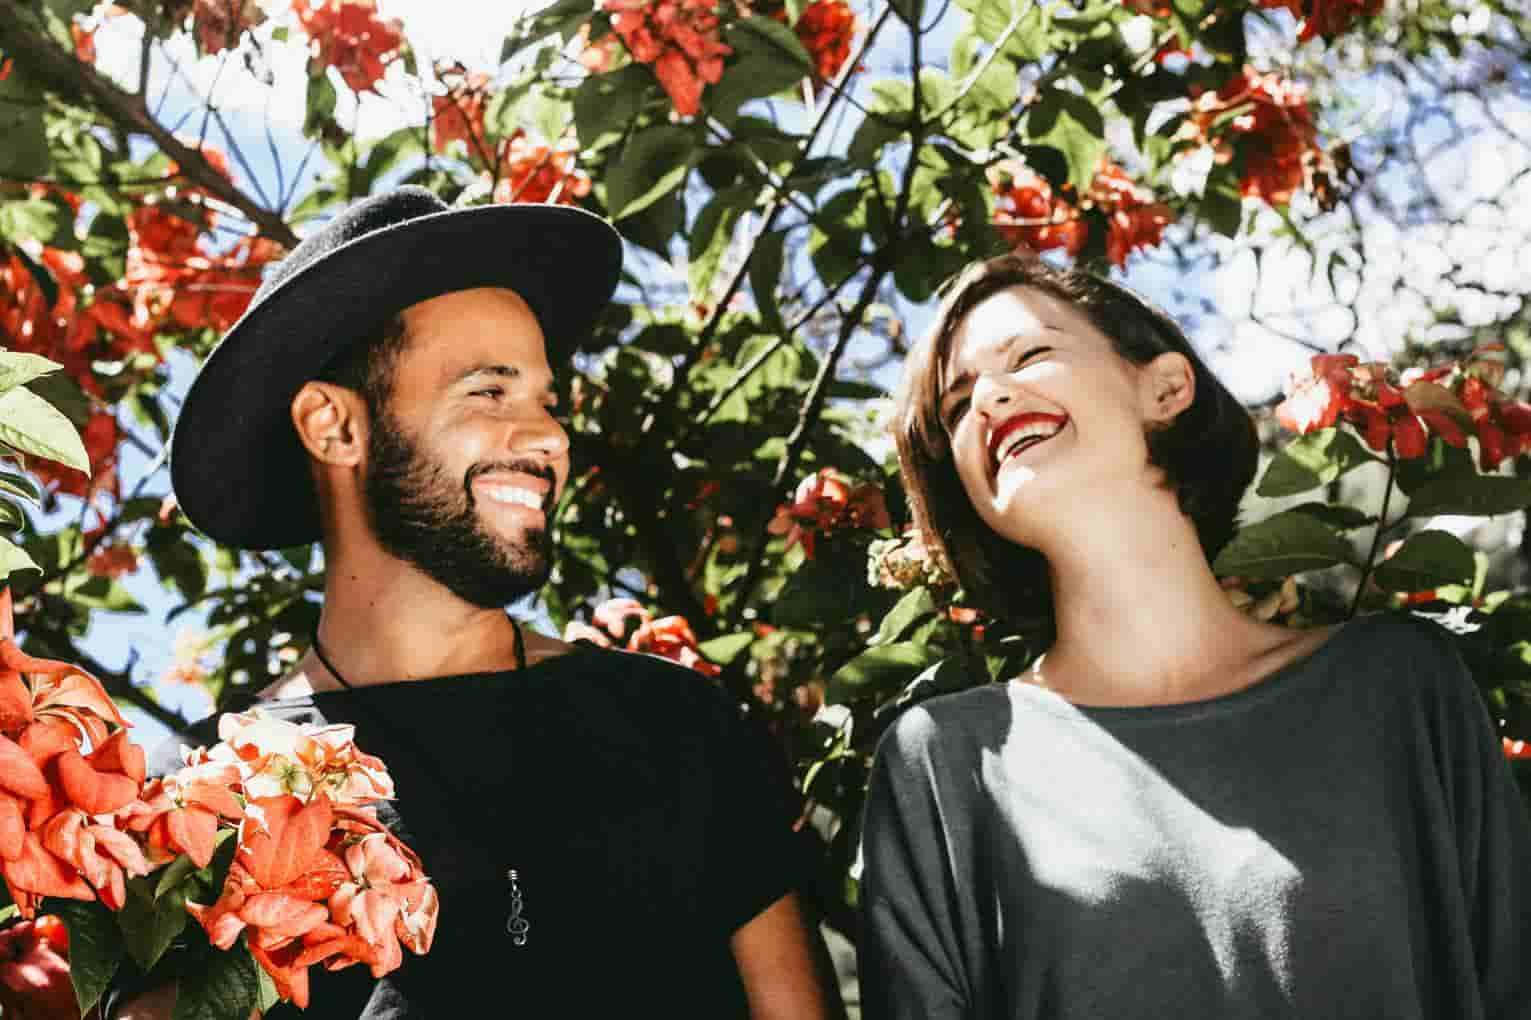 La mejor empresa multinivel hace sonreir a una parejaempresa multinivel